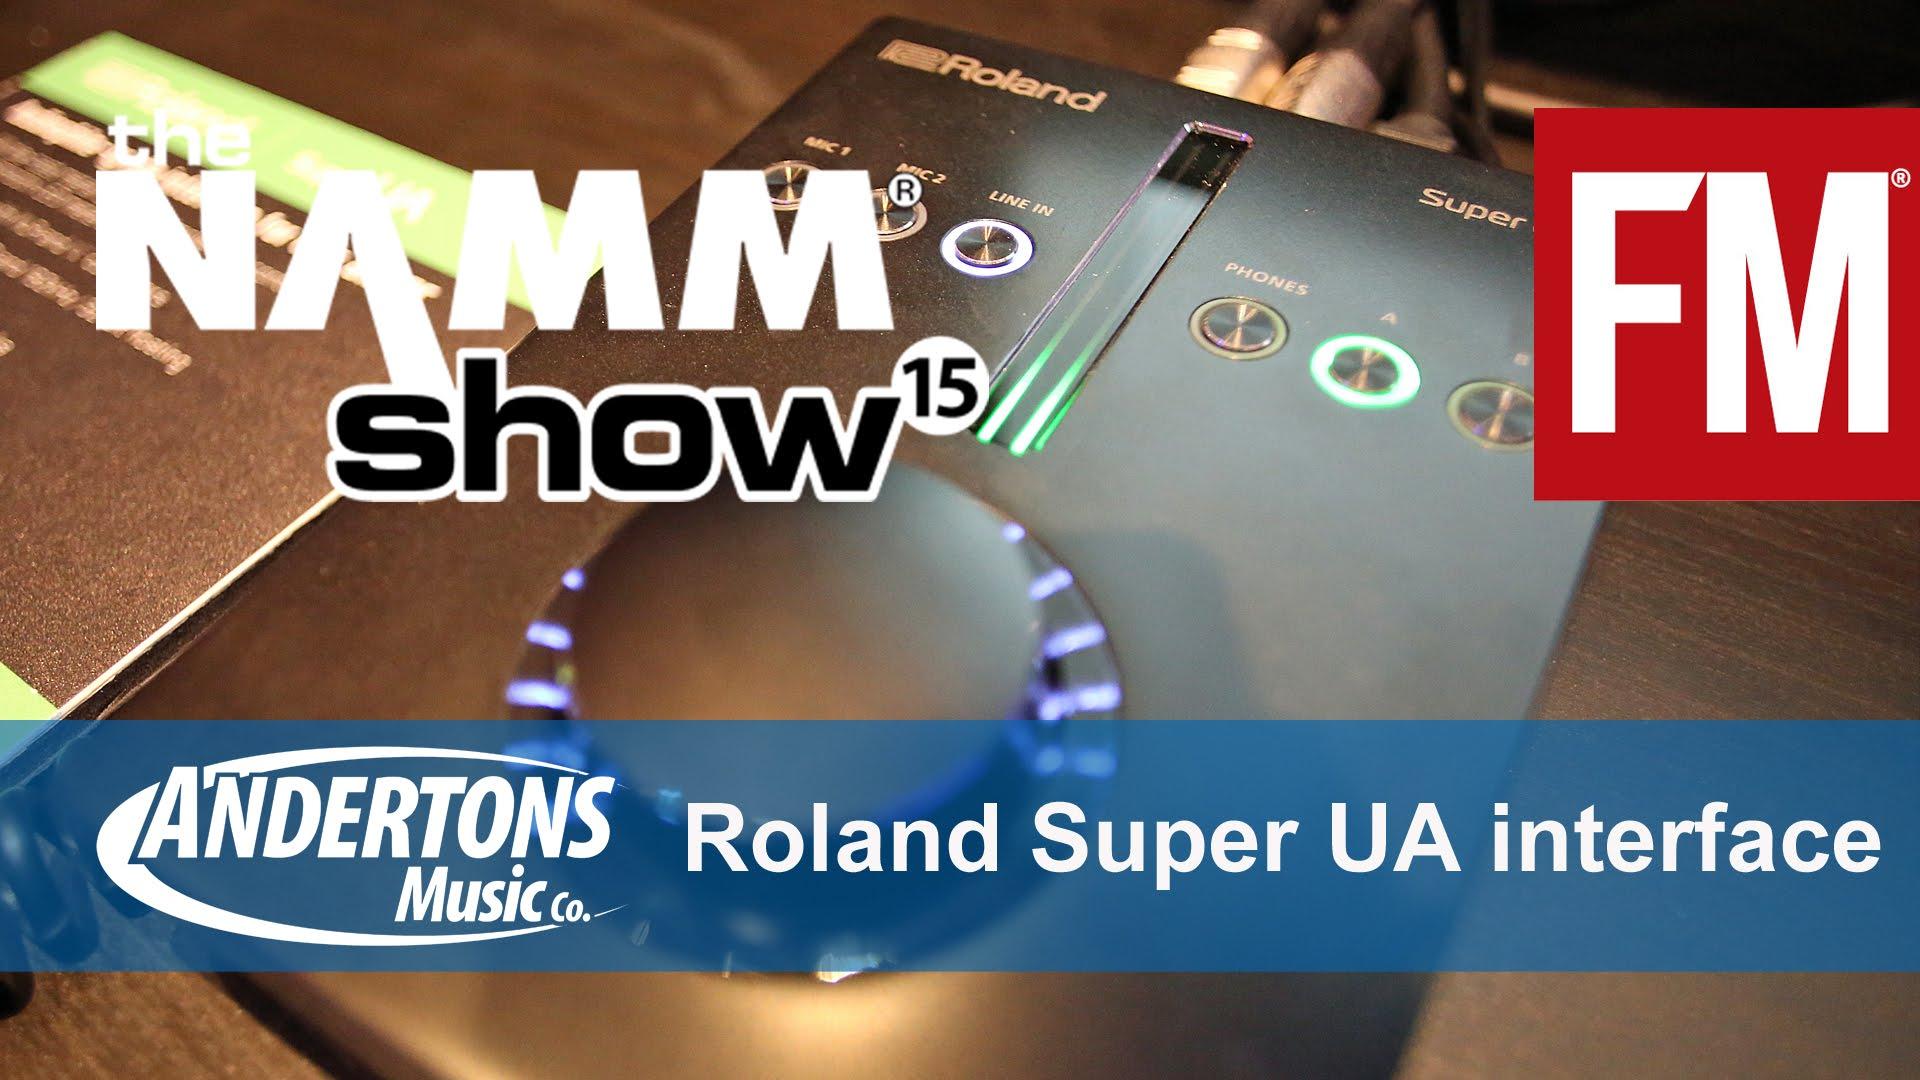 NAMM 2015 – Roland Super UA Audio Interface – YouTube